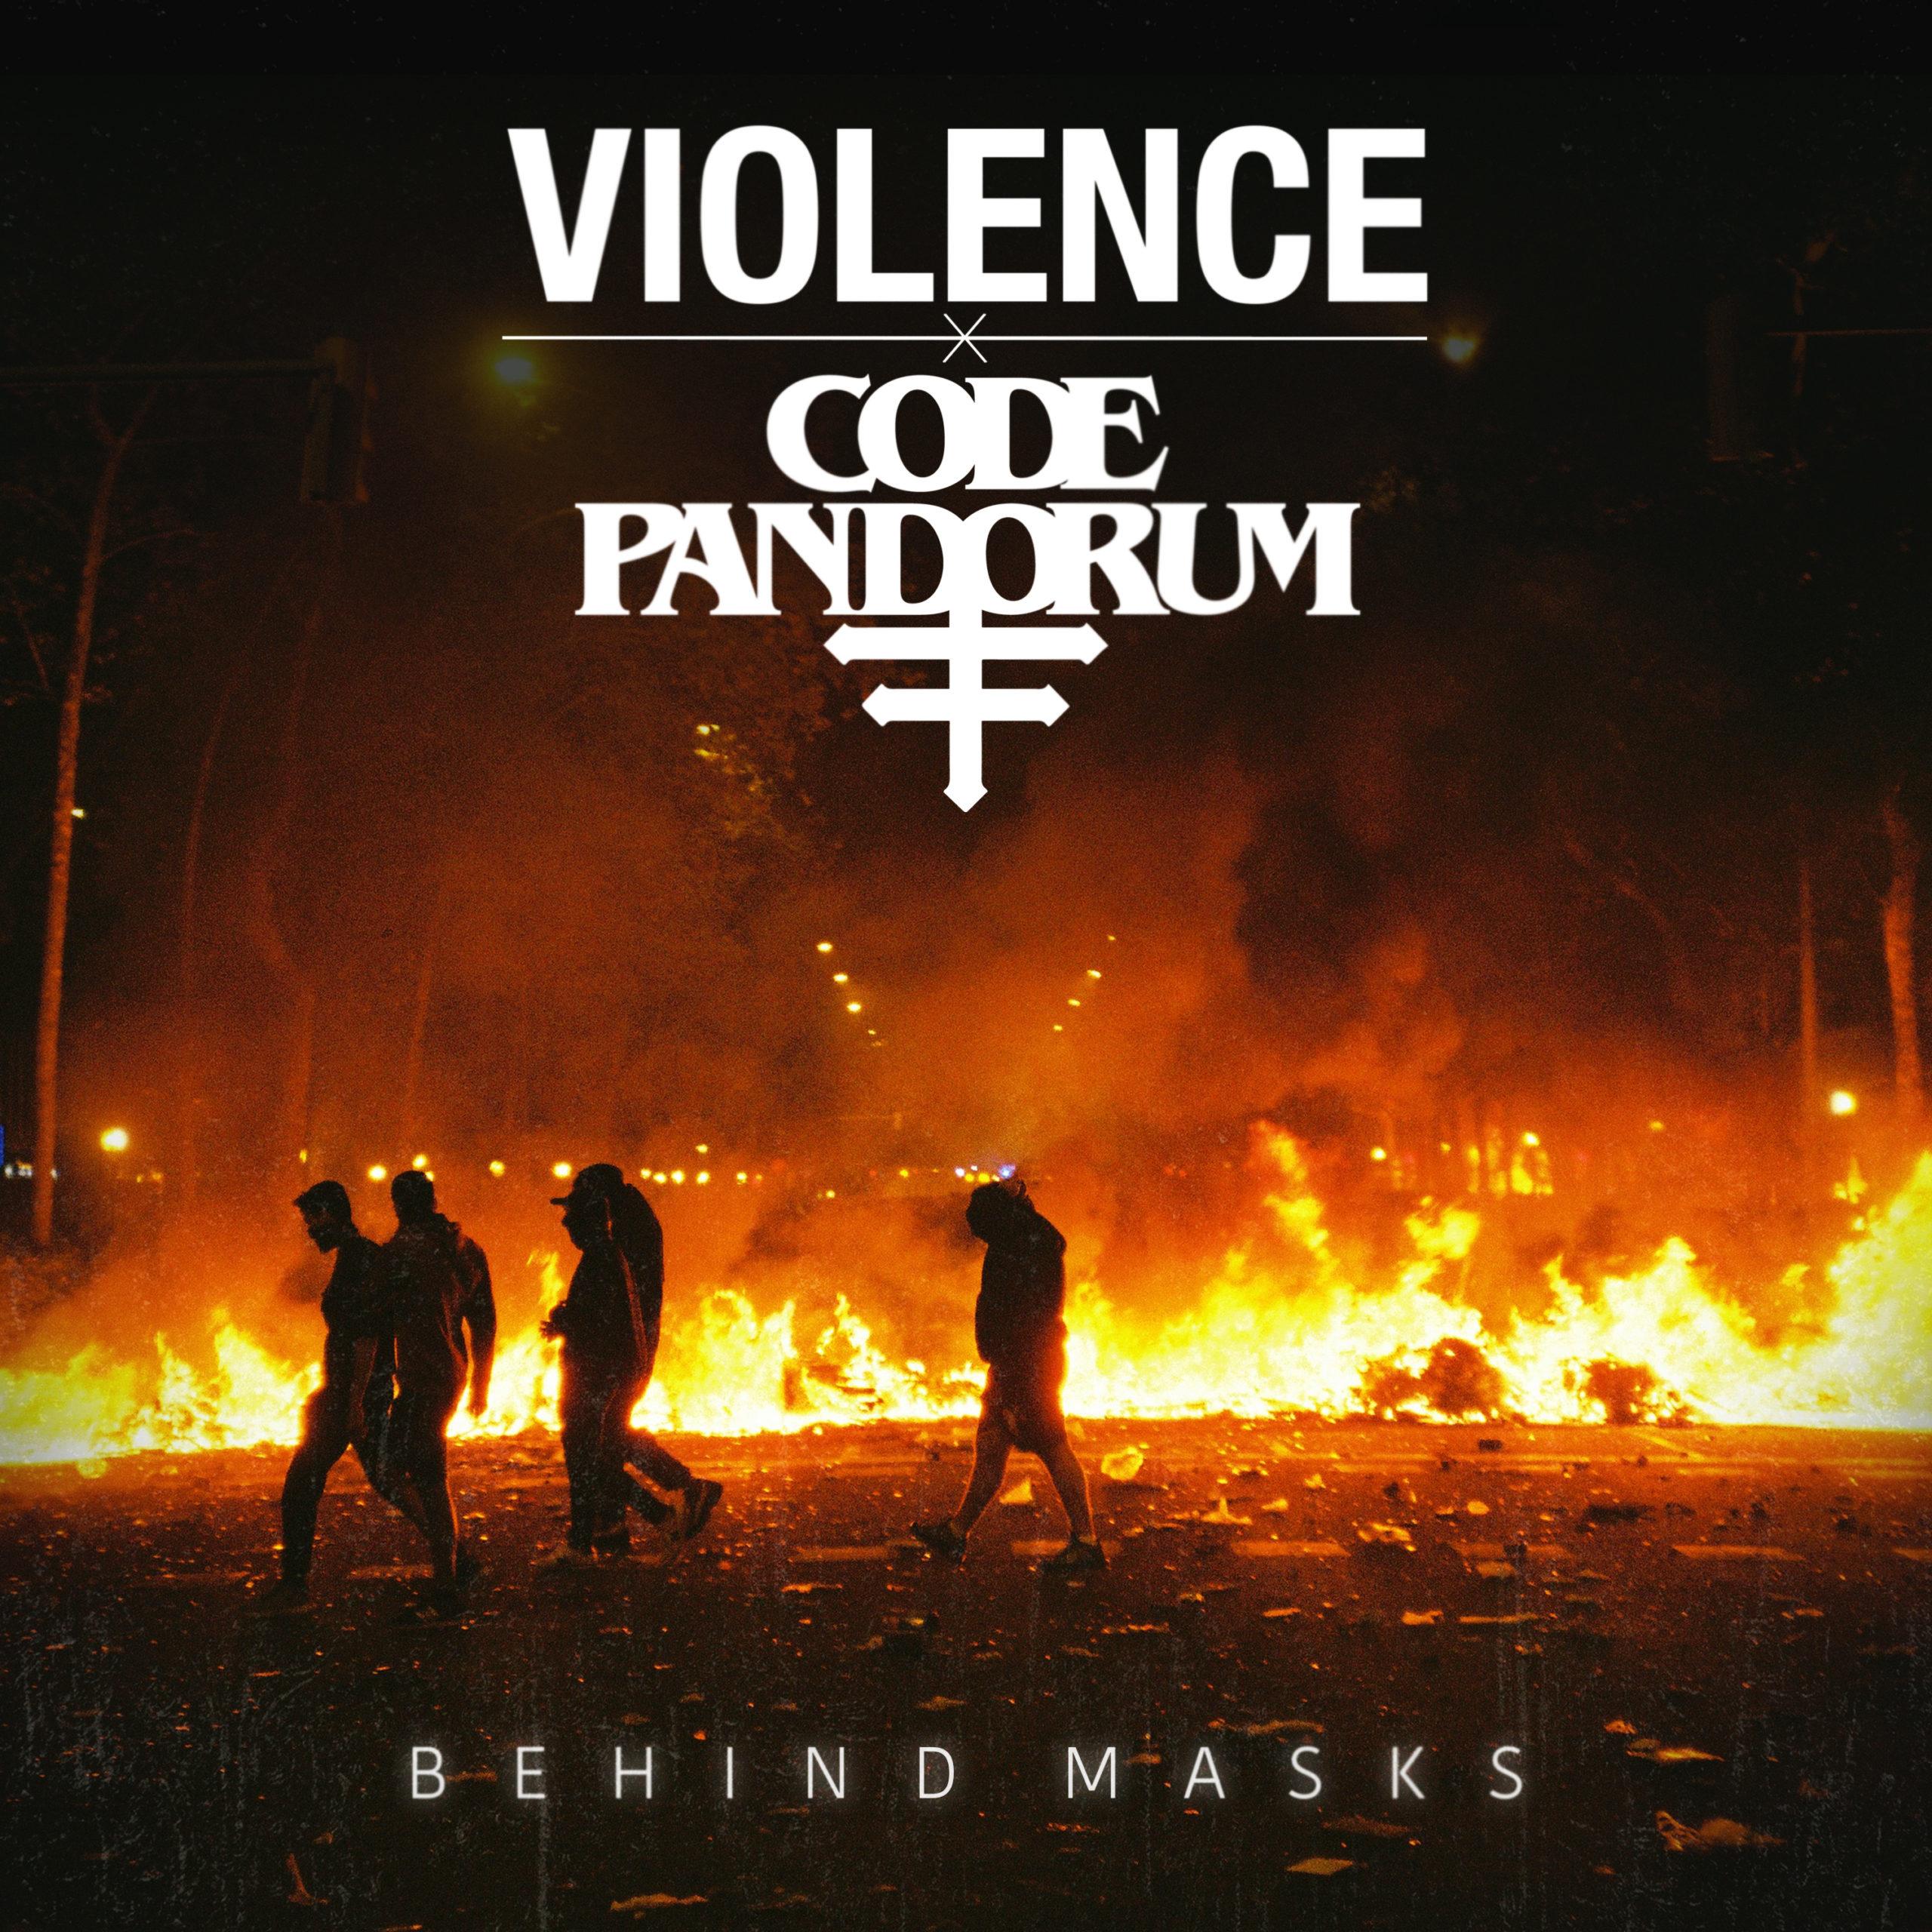 Violence Code: Pandorum Behind Masks cover